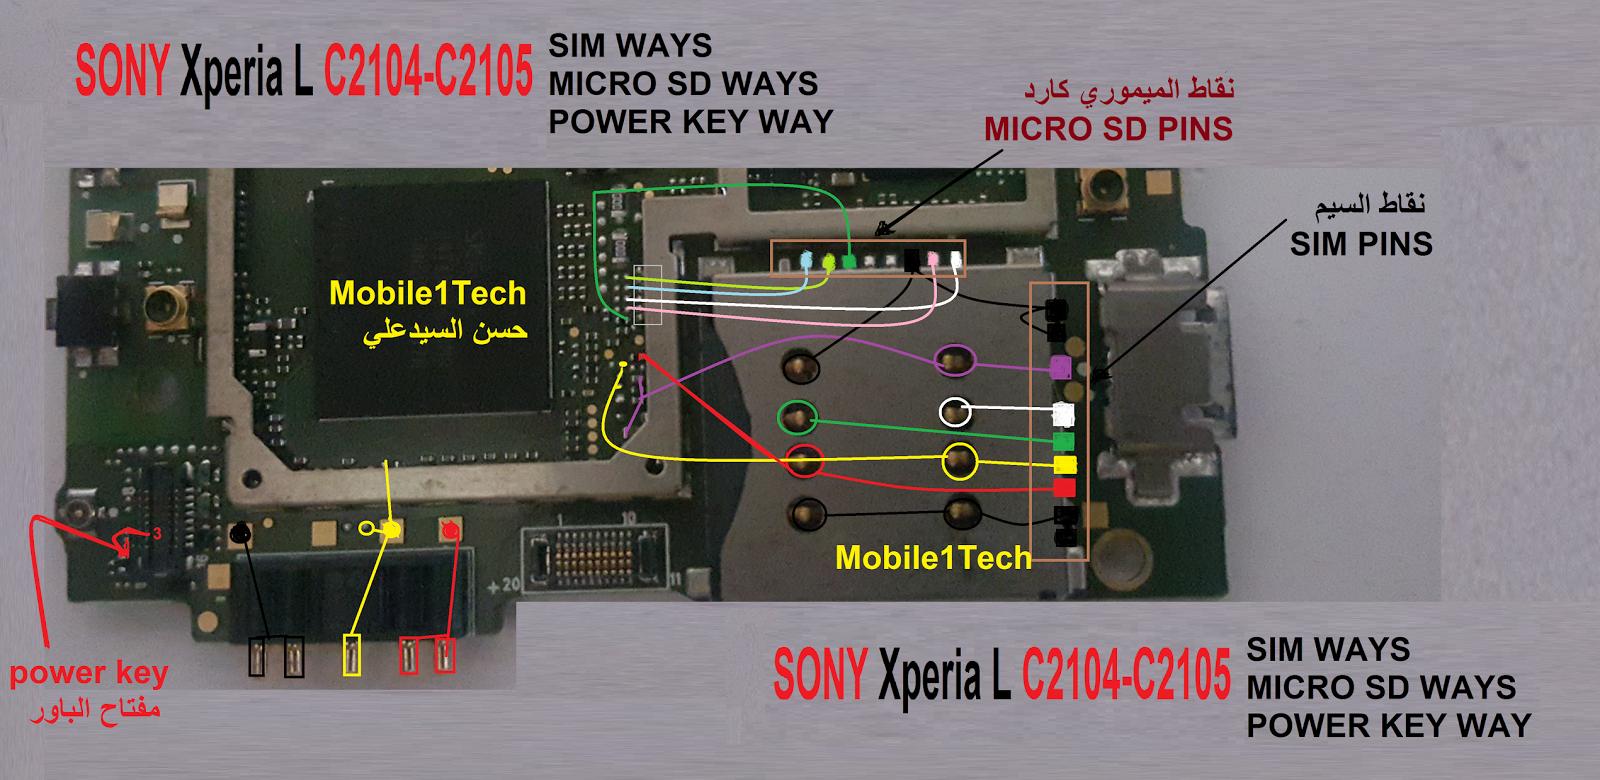 sony xperia j circuit diagram wiring diagram Sony Xperia C Circuit Diagram sony xperia c circuit diagram wiring